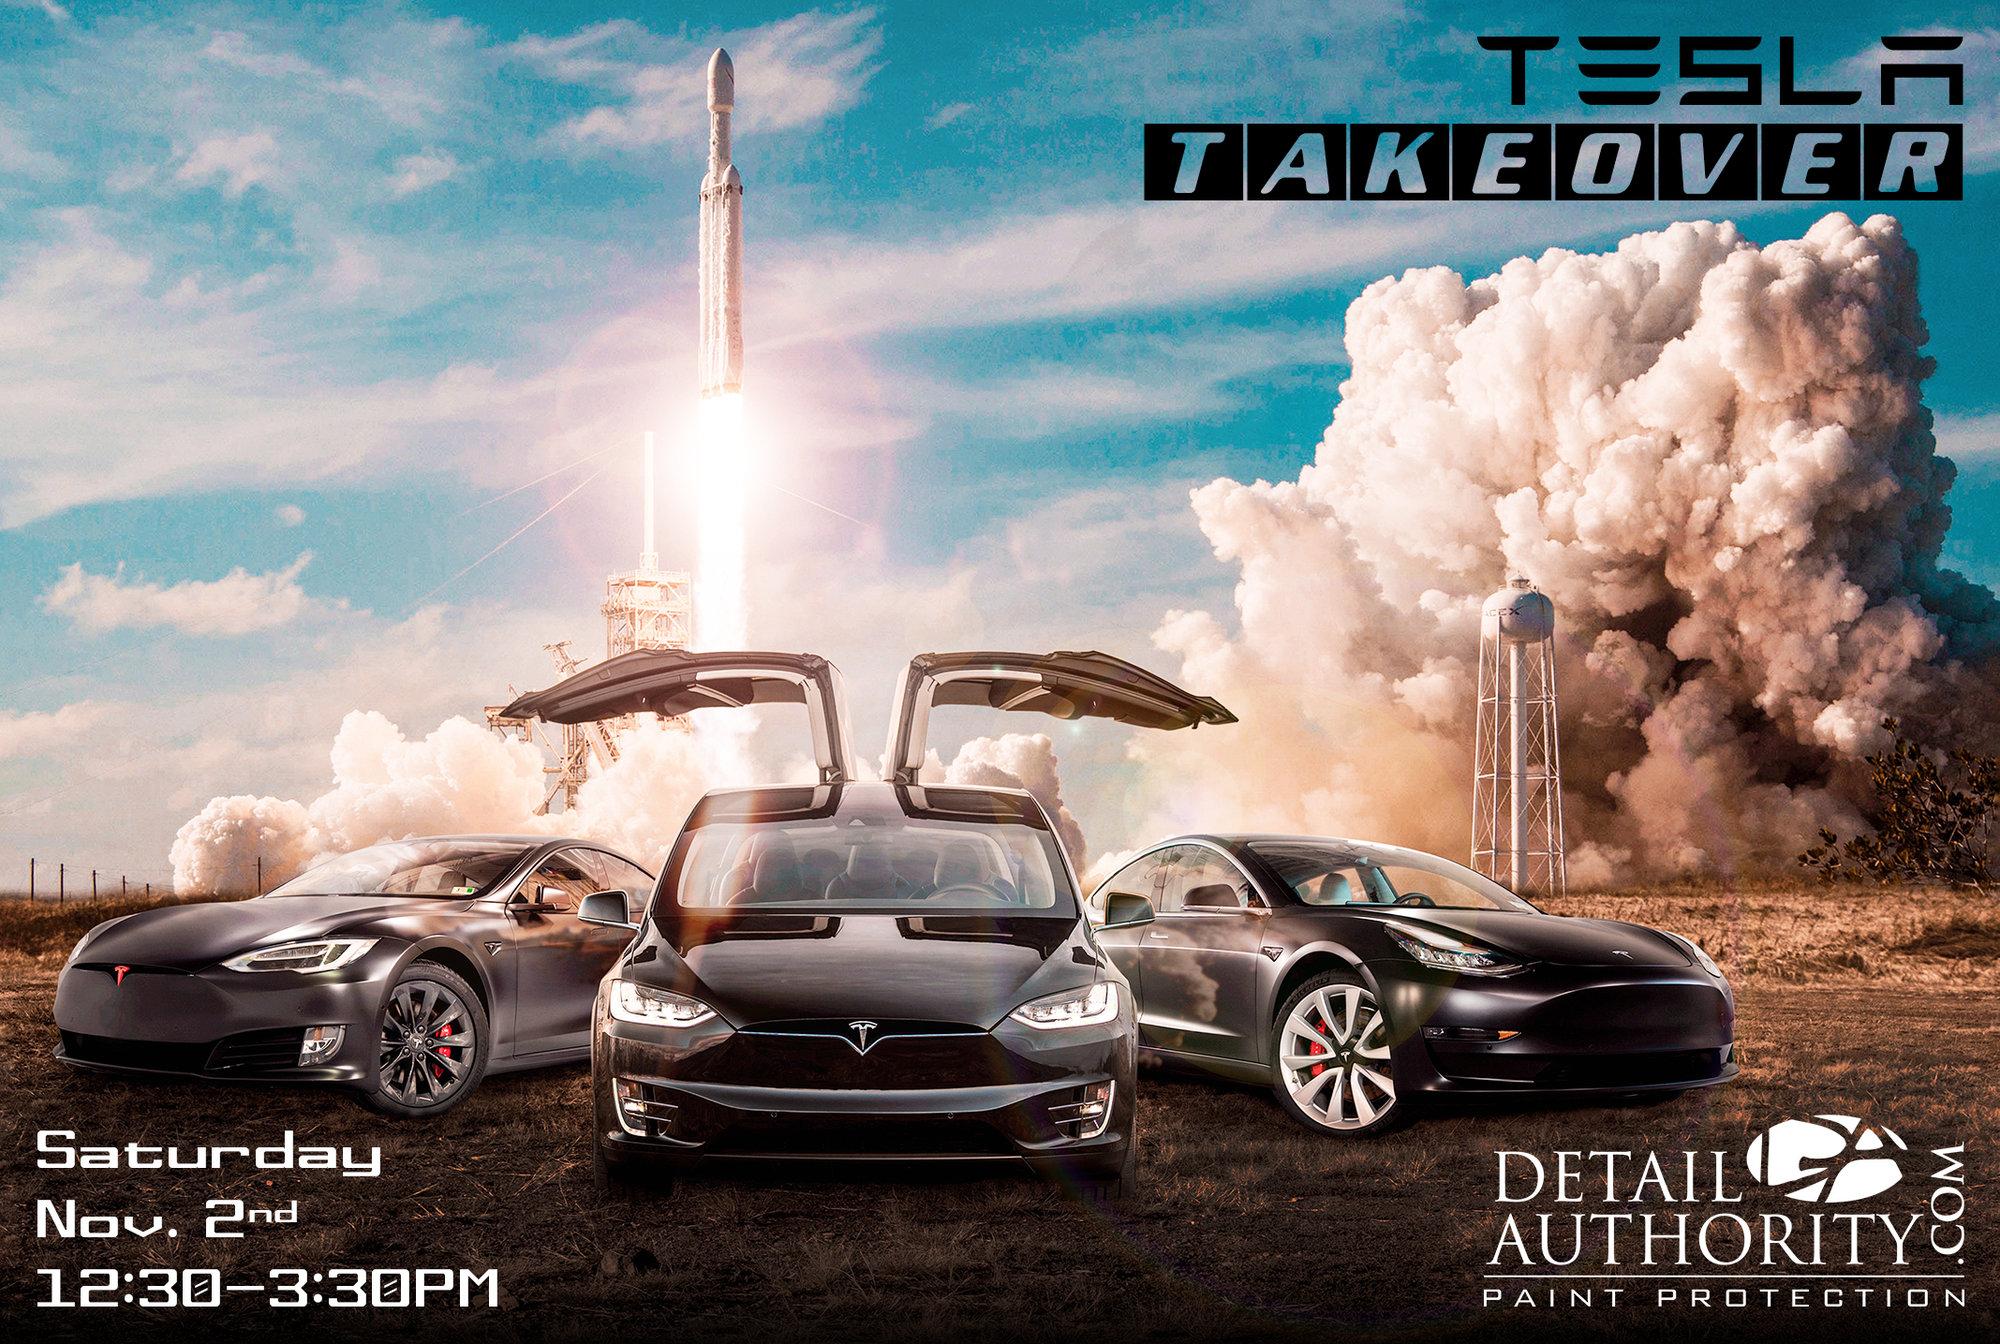 Tesla Takeover 4x6 postcard.jpg